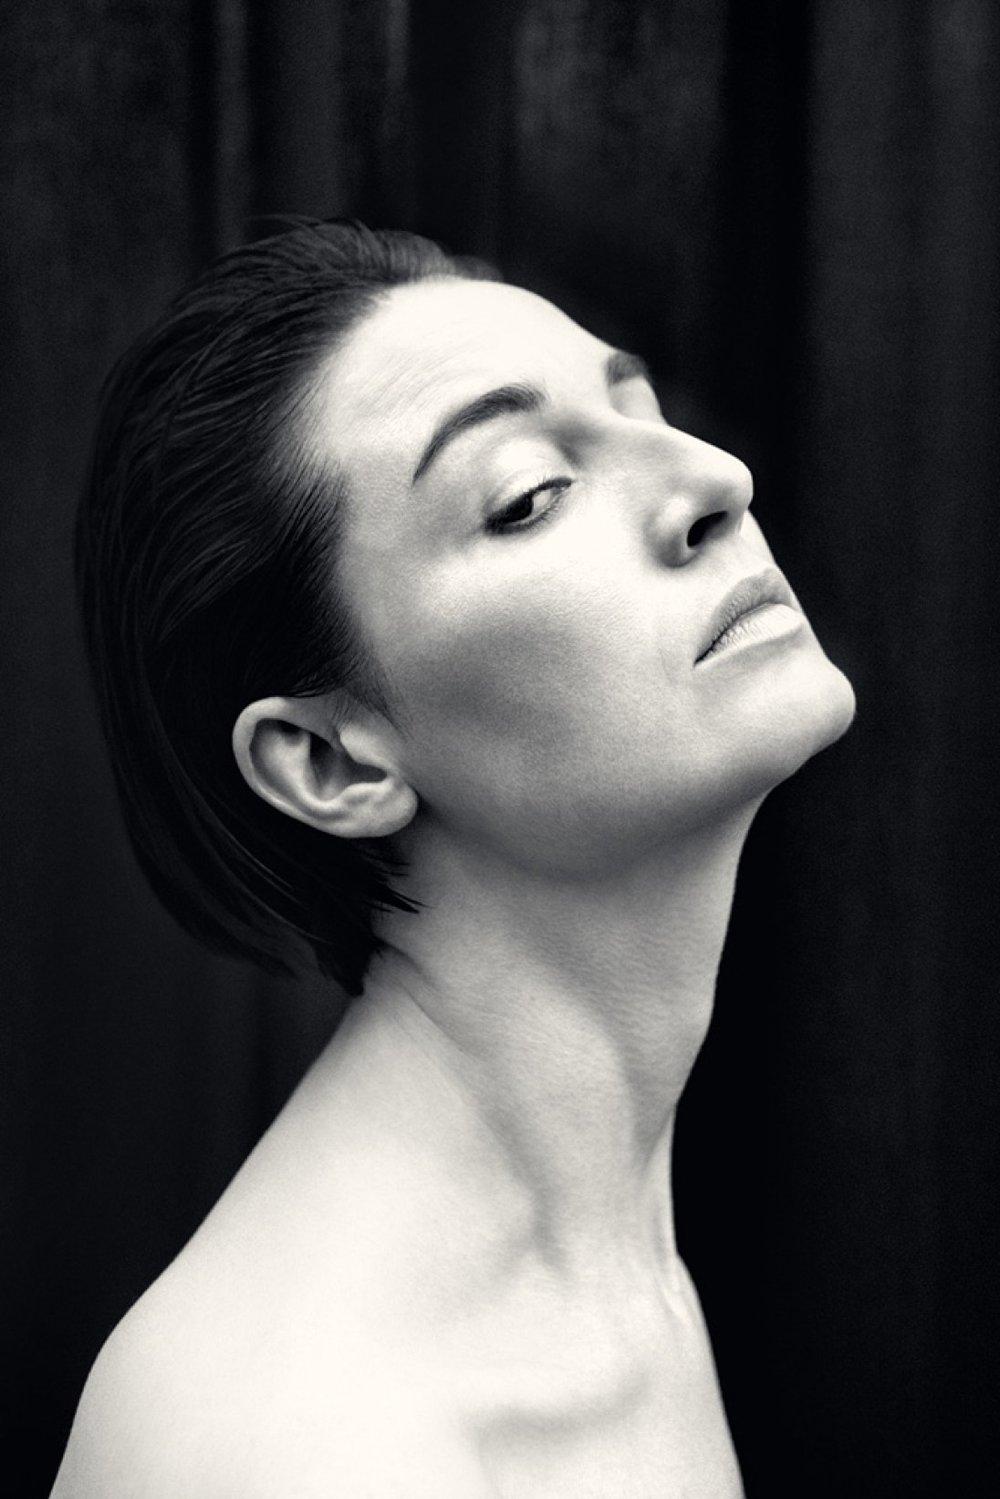 Erin O'Connor by Francesco Carrozzini